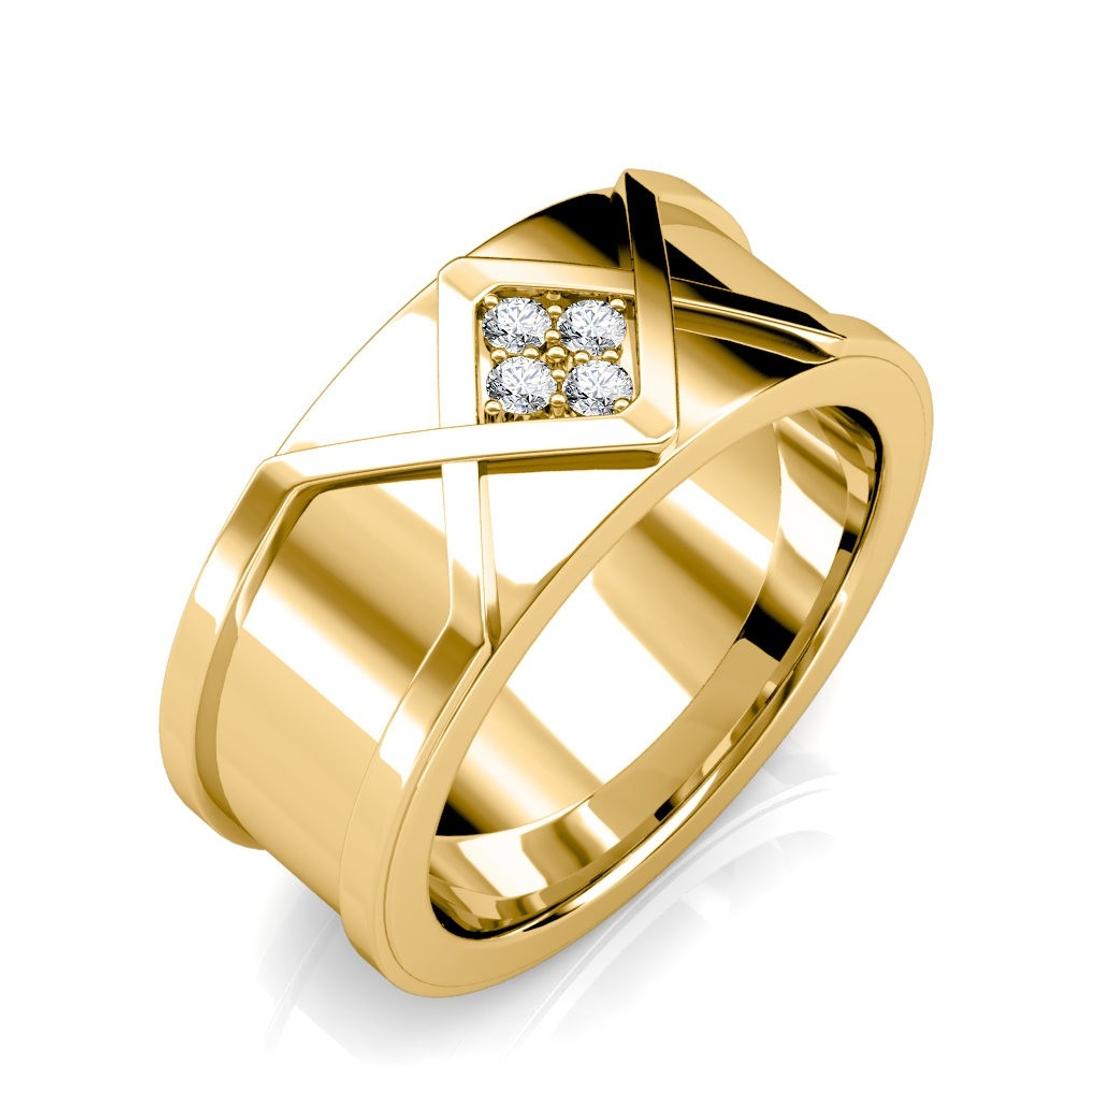 The Ross Diamond Ring For Him